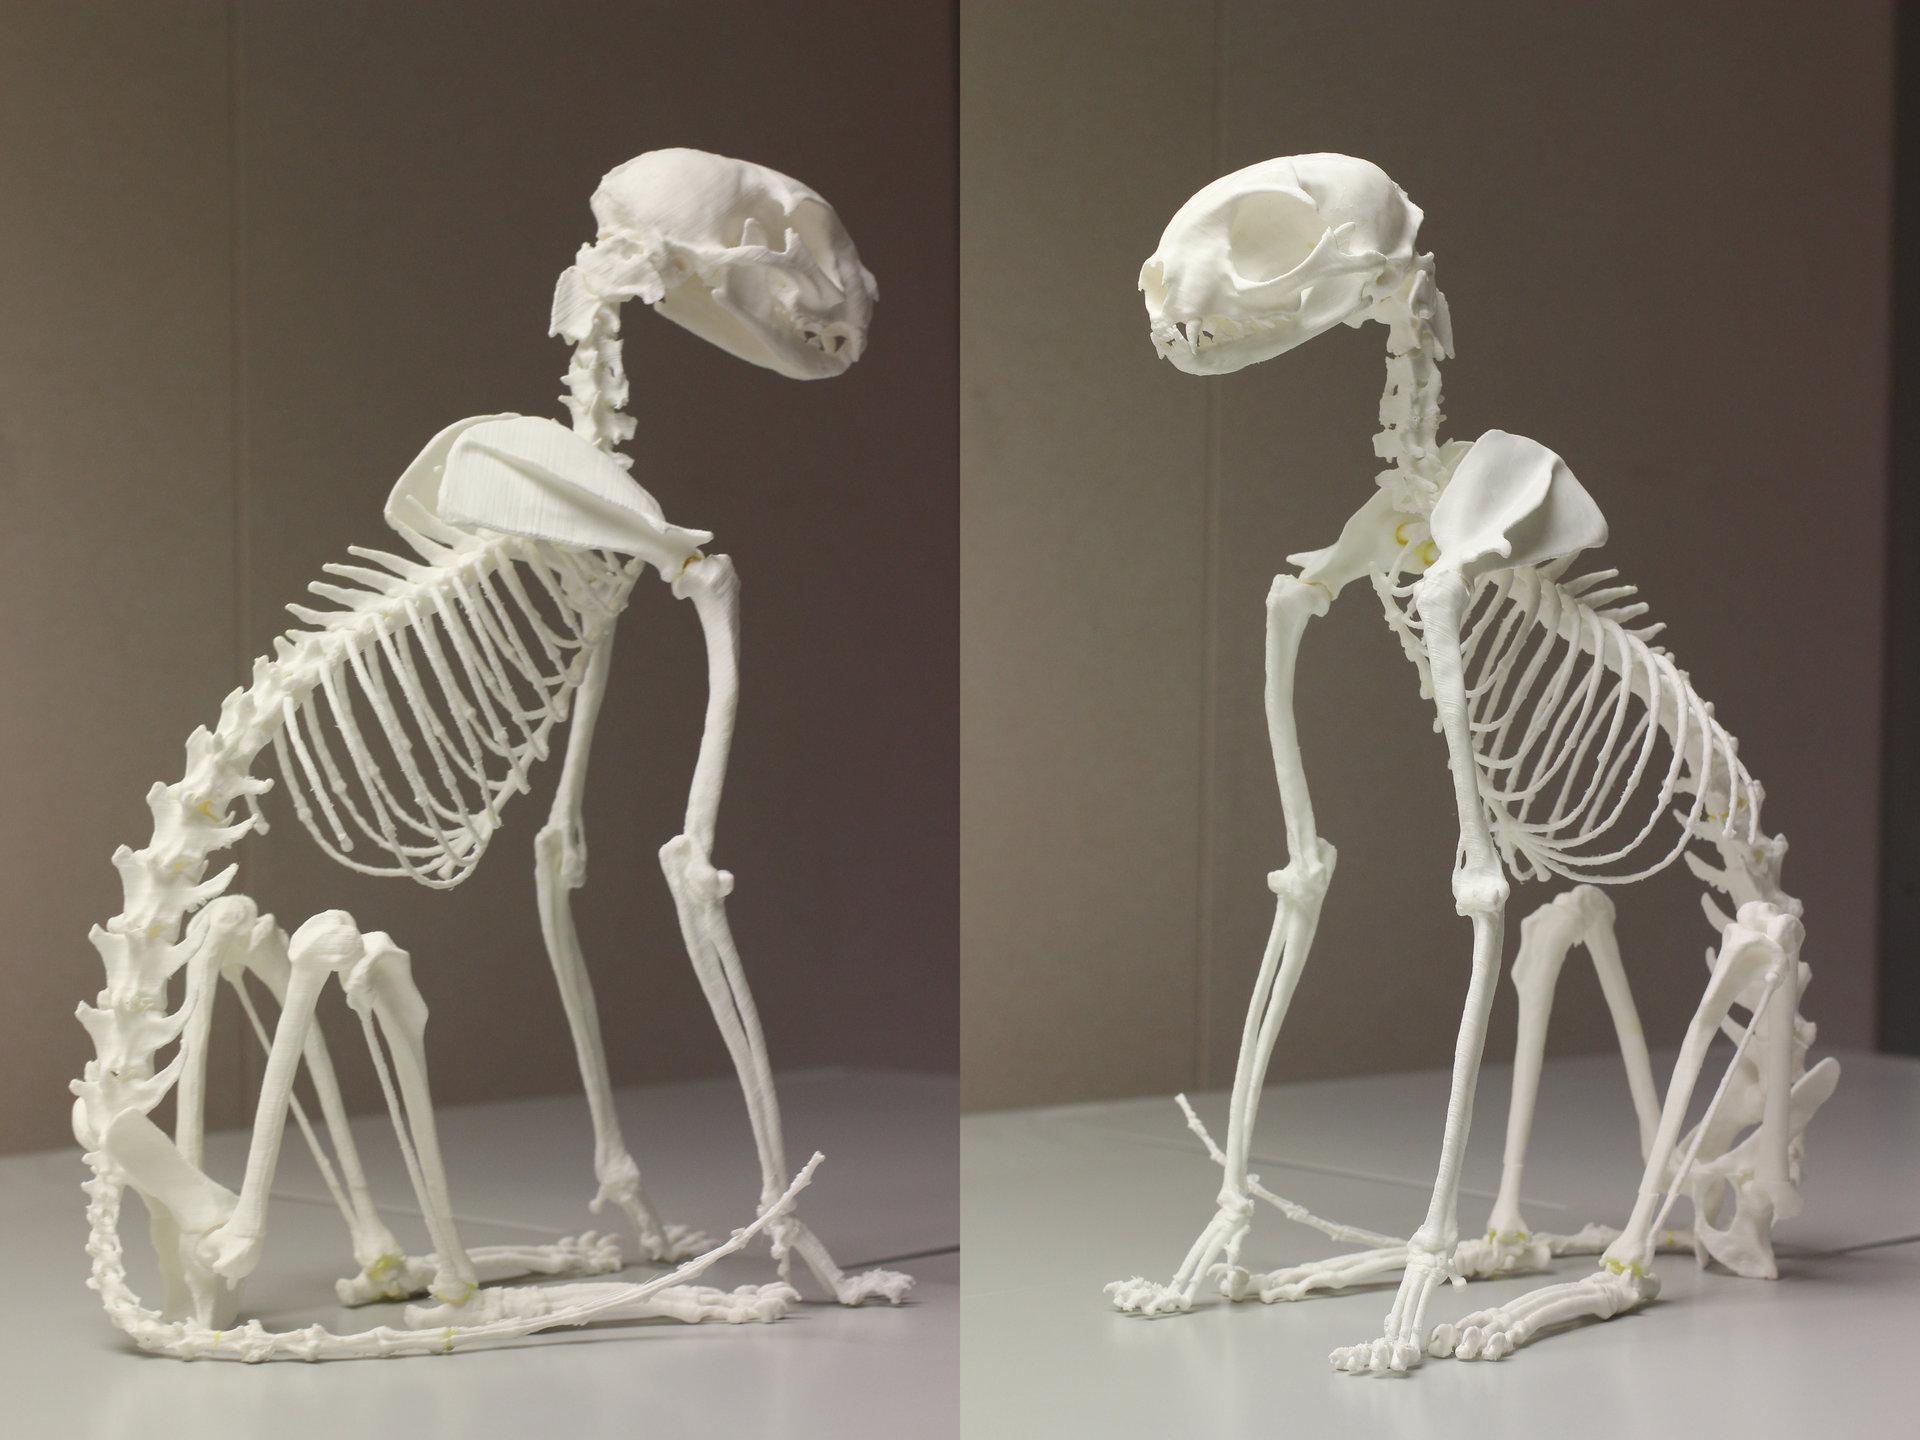 jonathan seeney - 3d printed cat skeleton